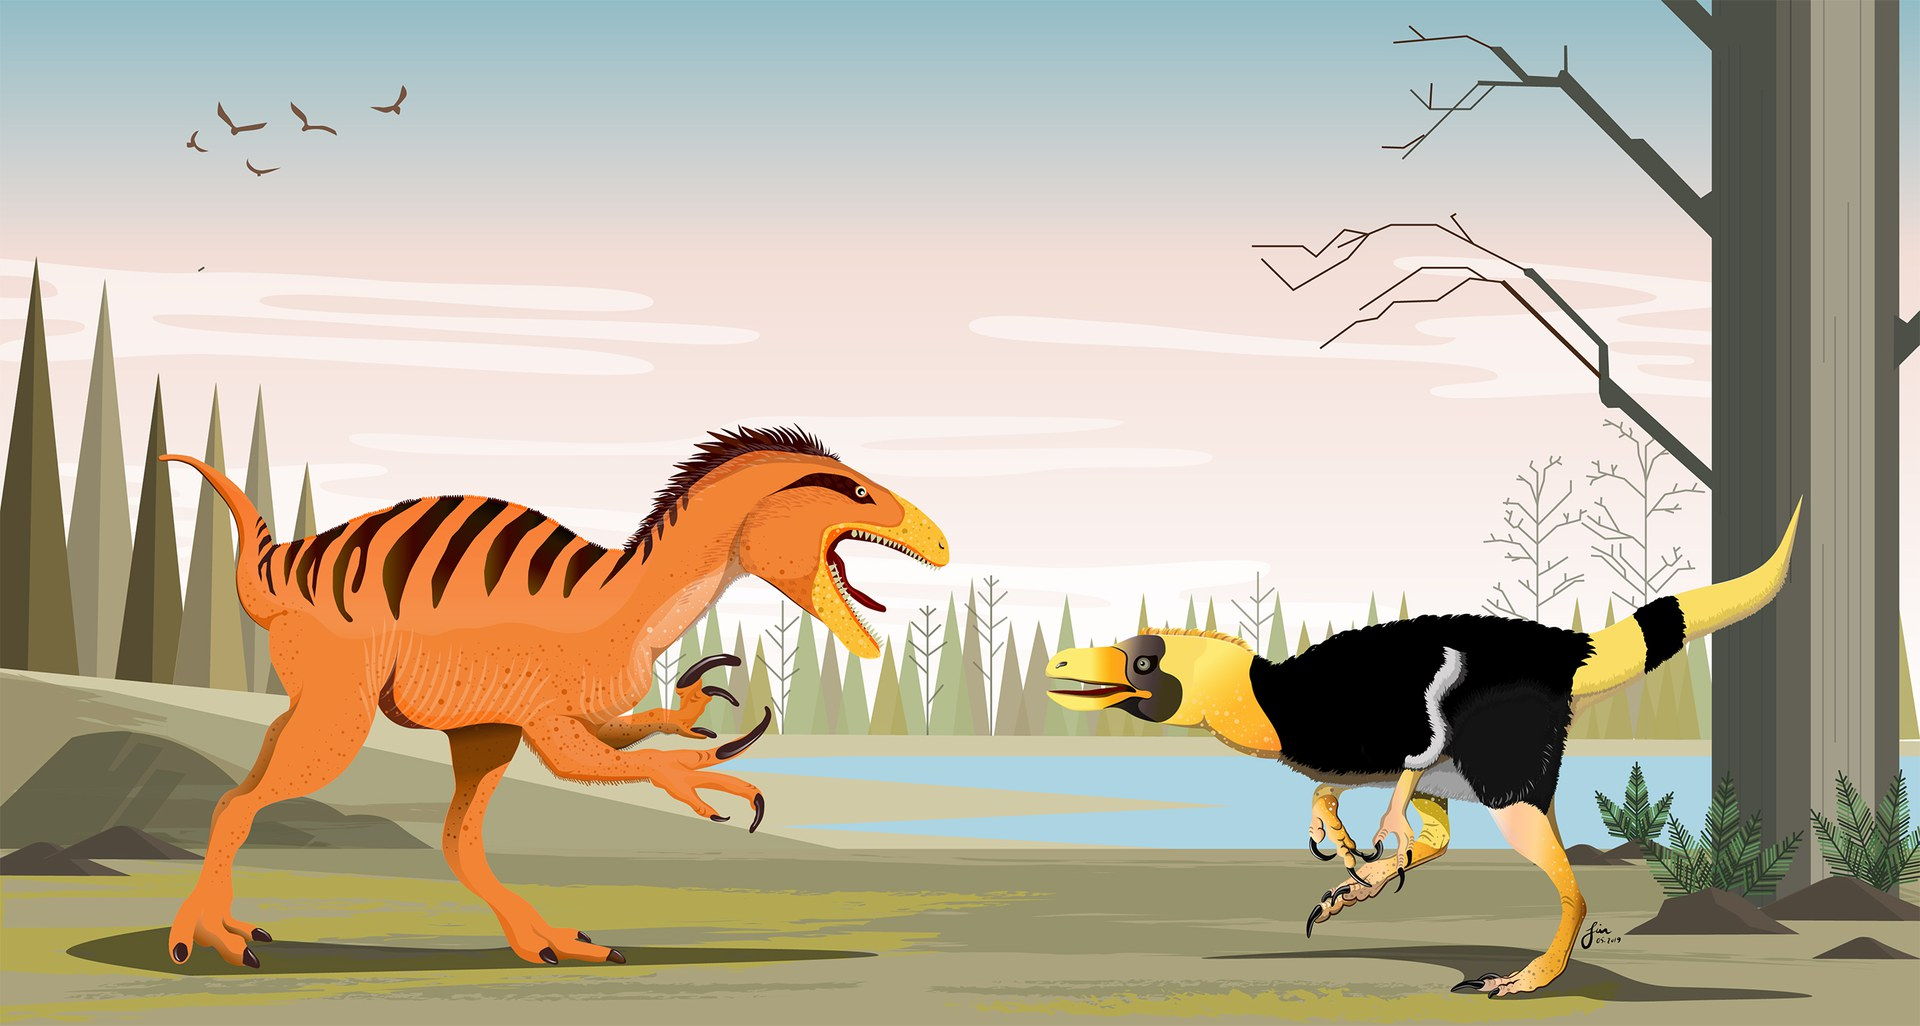 Phuwiangvenator und Vayuraptor